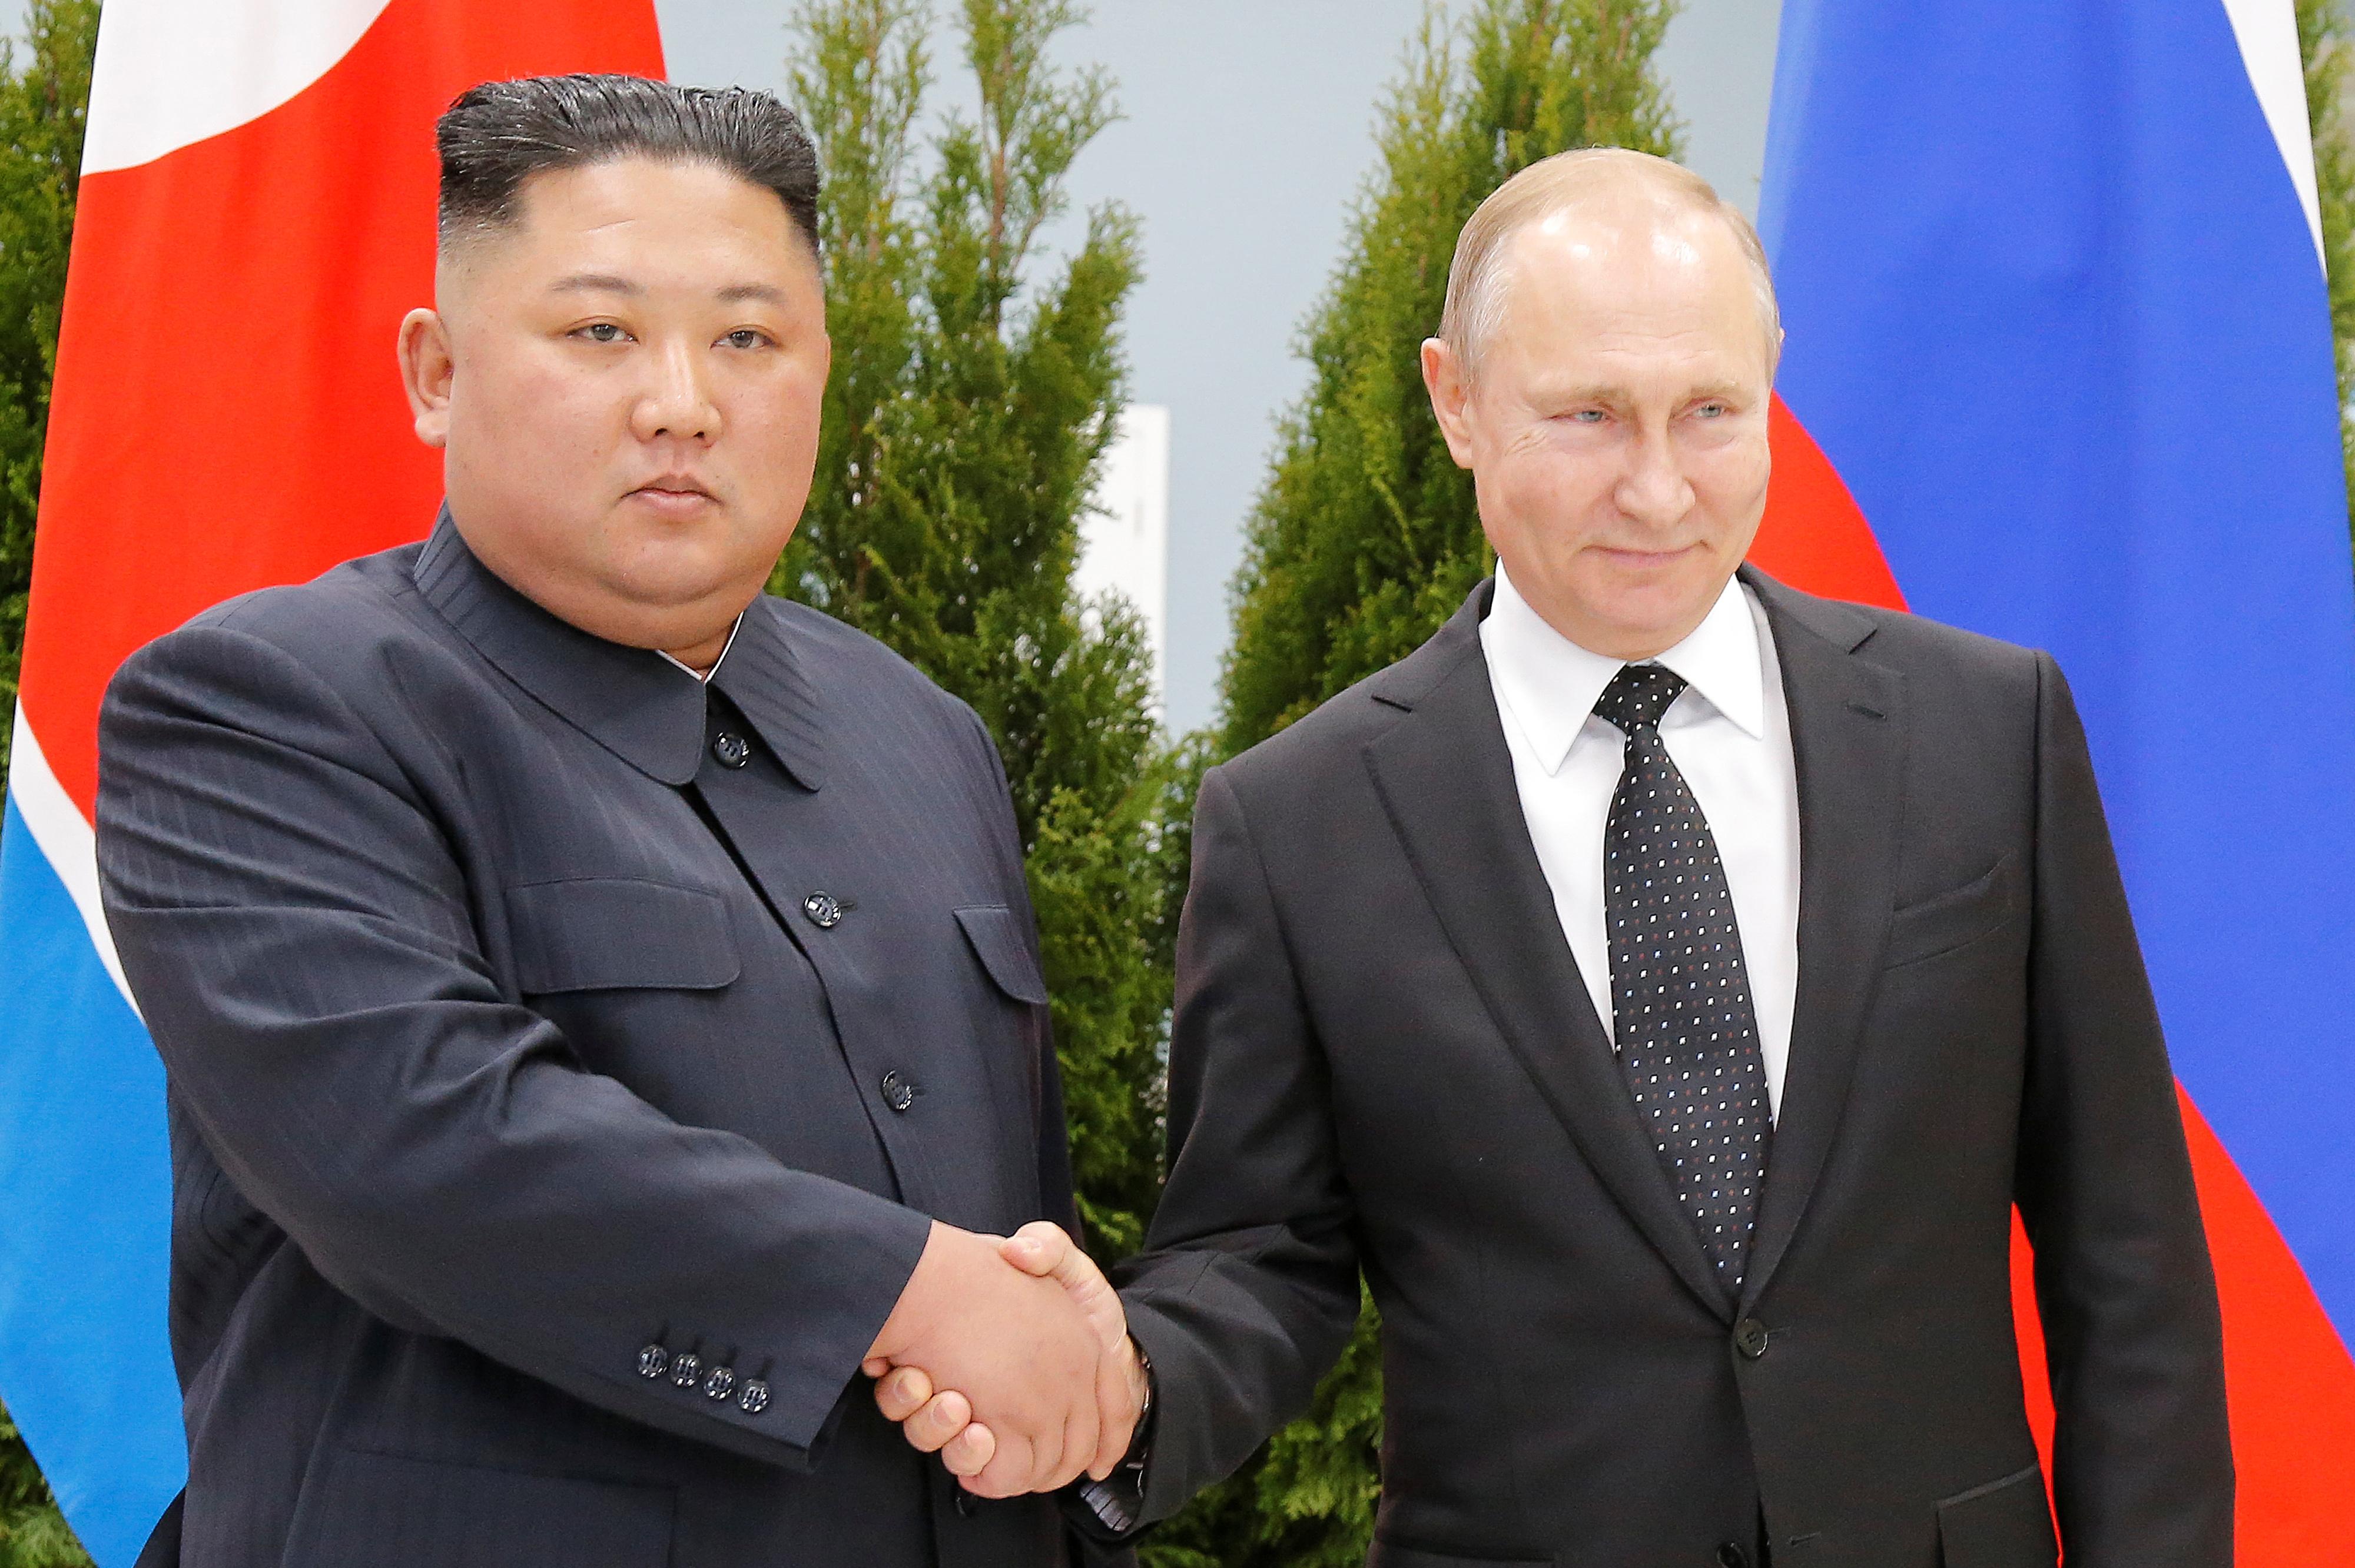 North Korea's Kim says he will coordinate views on peninsula issues with Putin